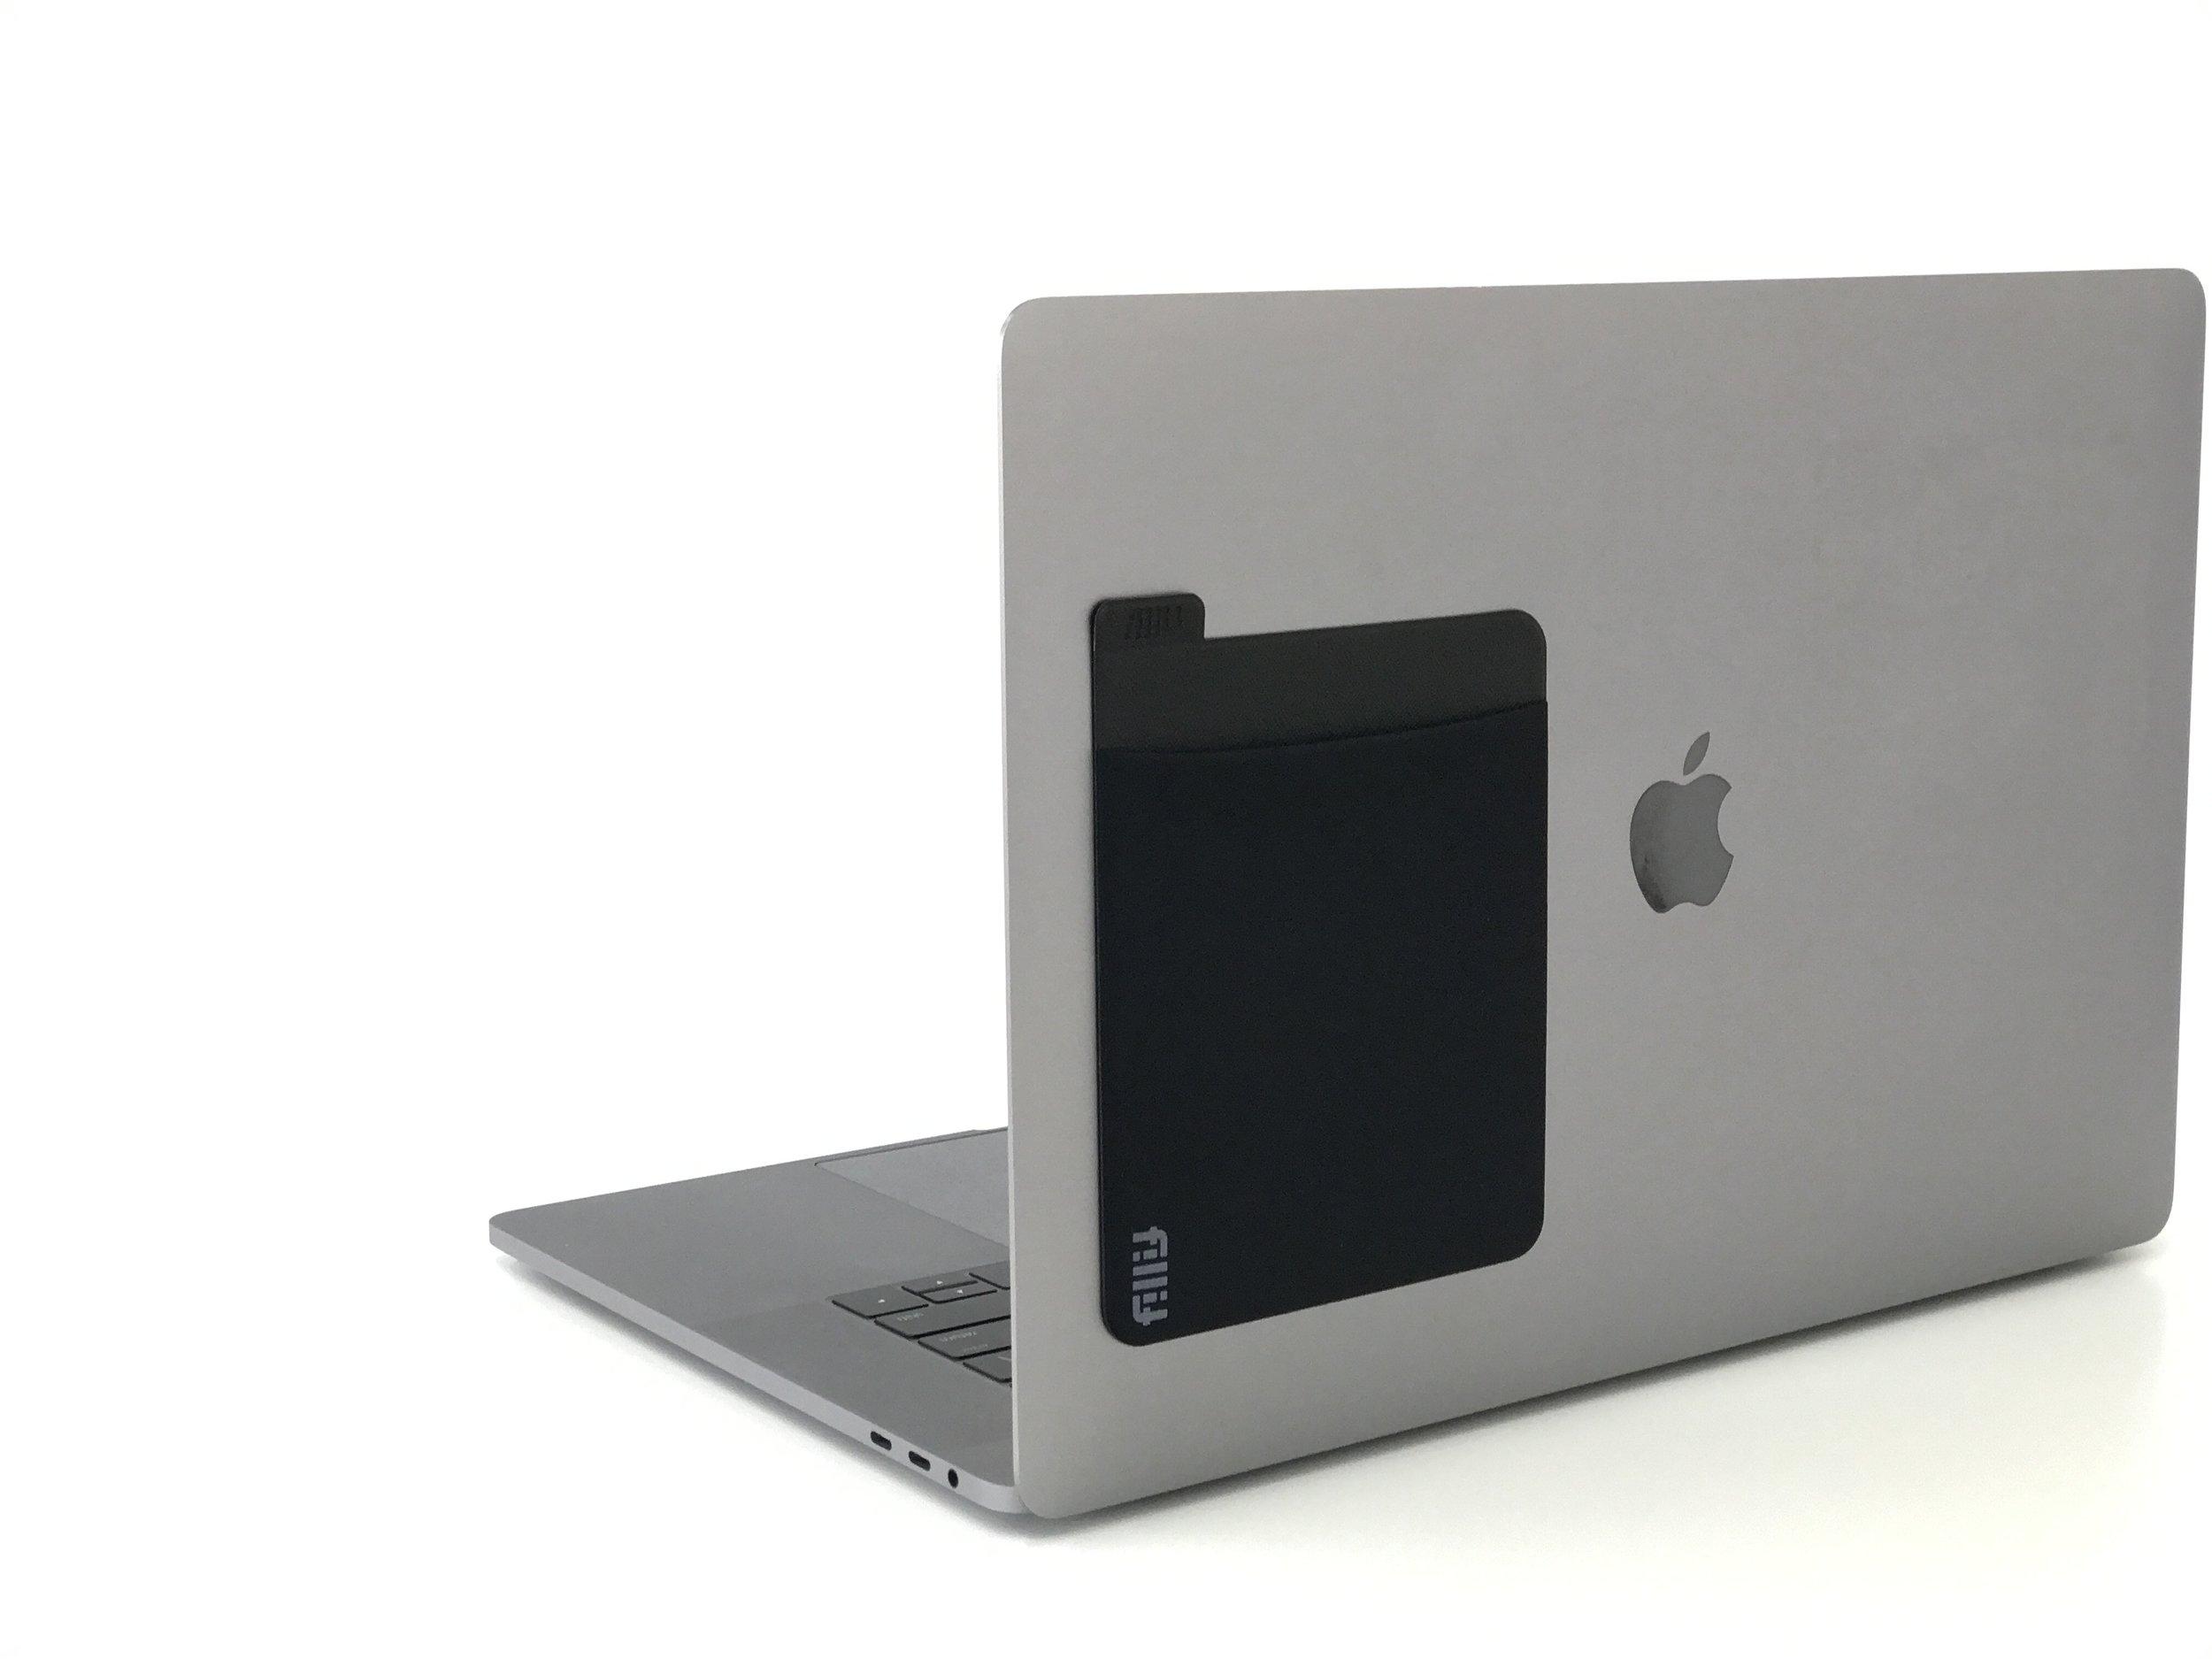 FillitPocket_Macbook_Empty